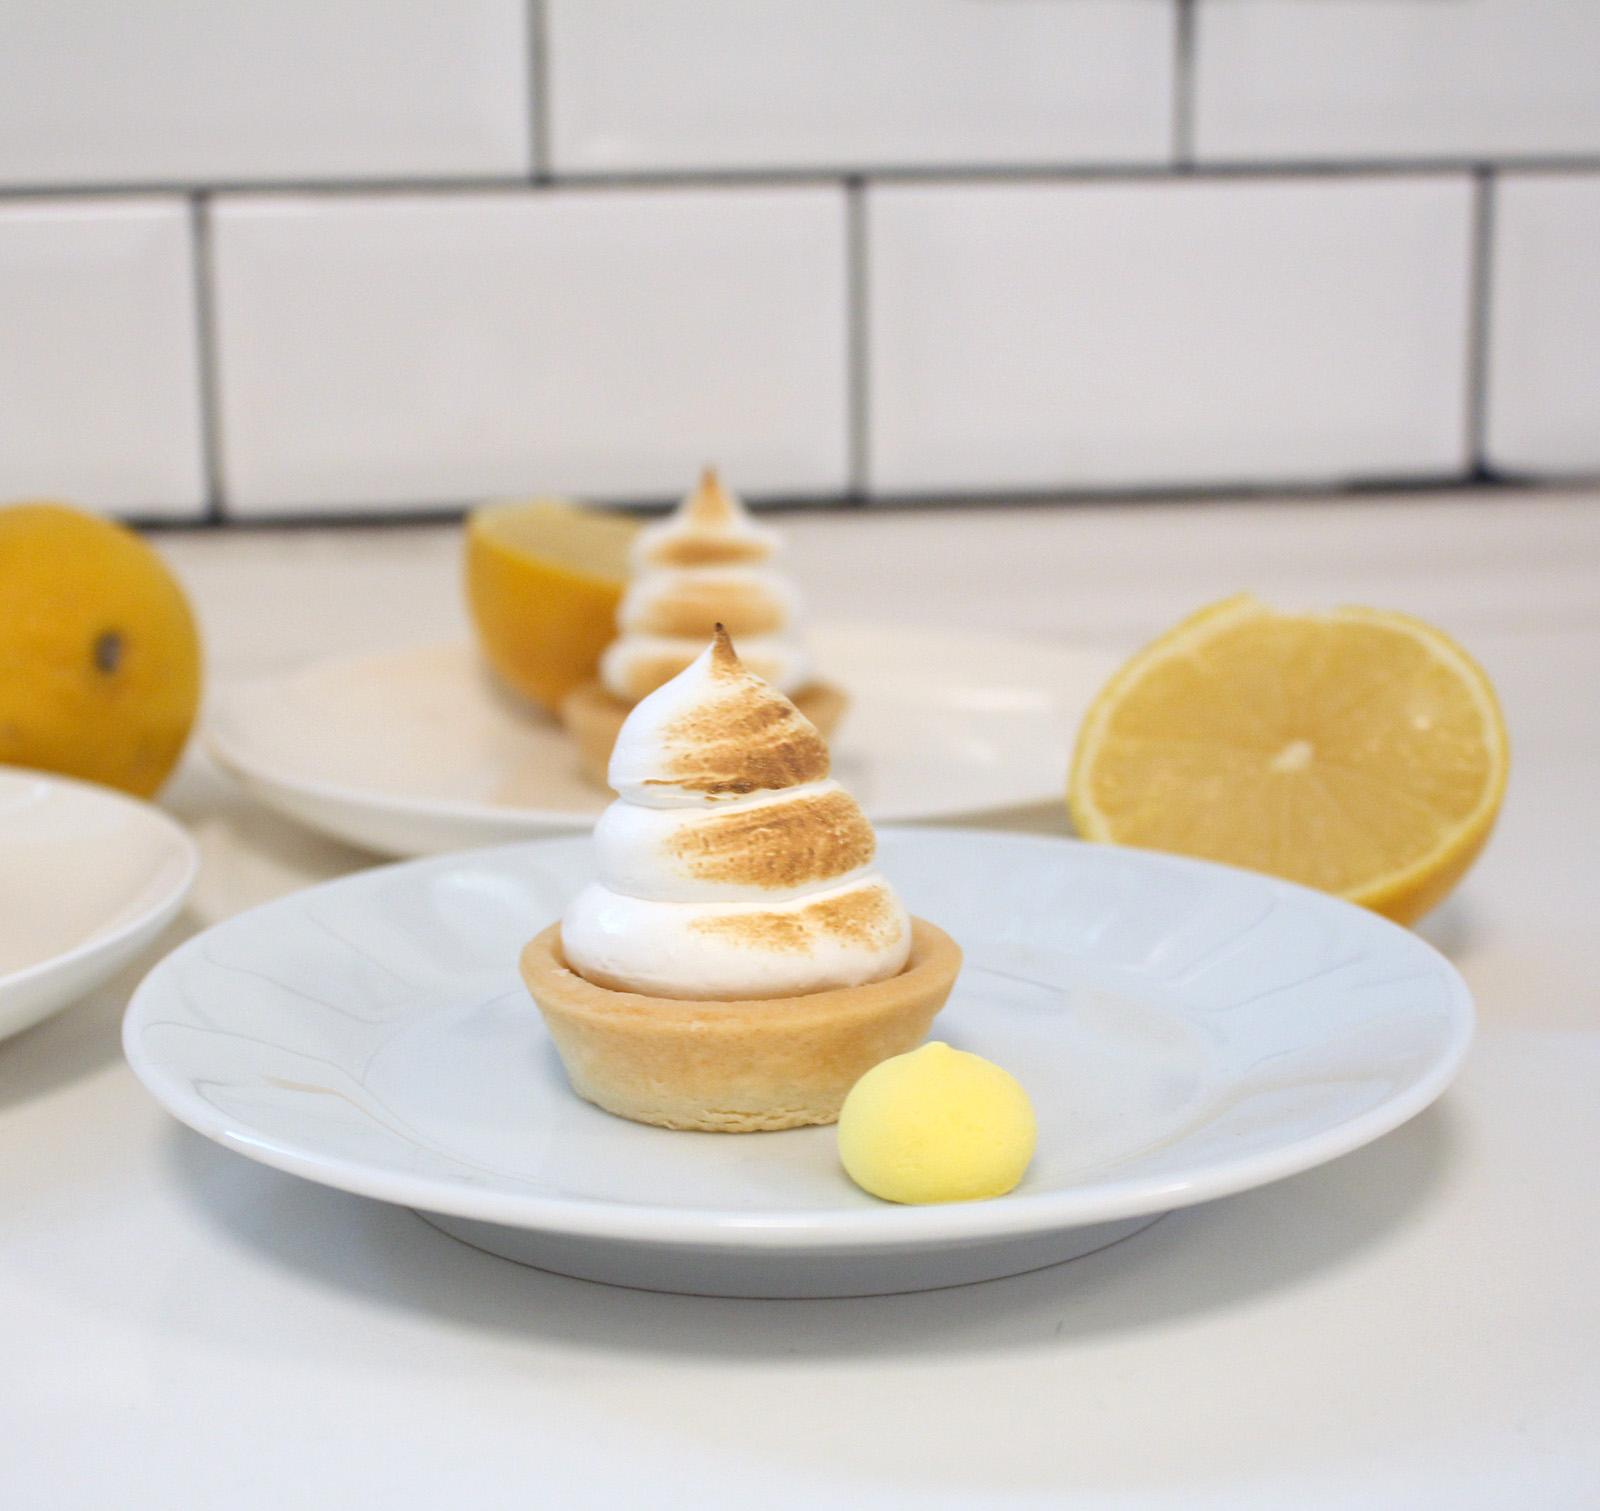 IMG 1492 1 - טרטלת לימון עם מרנג צרוב